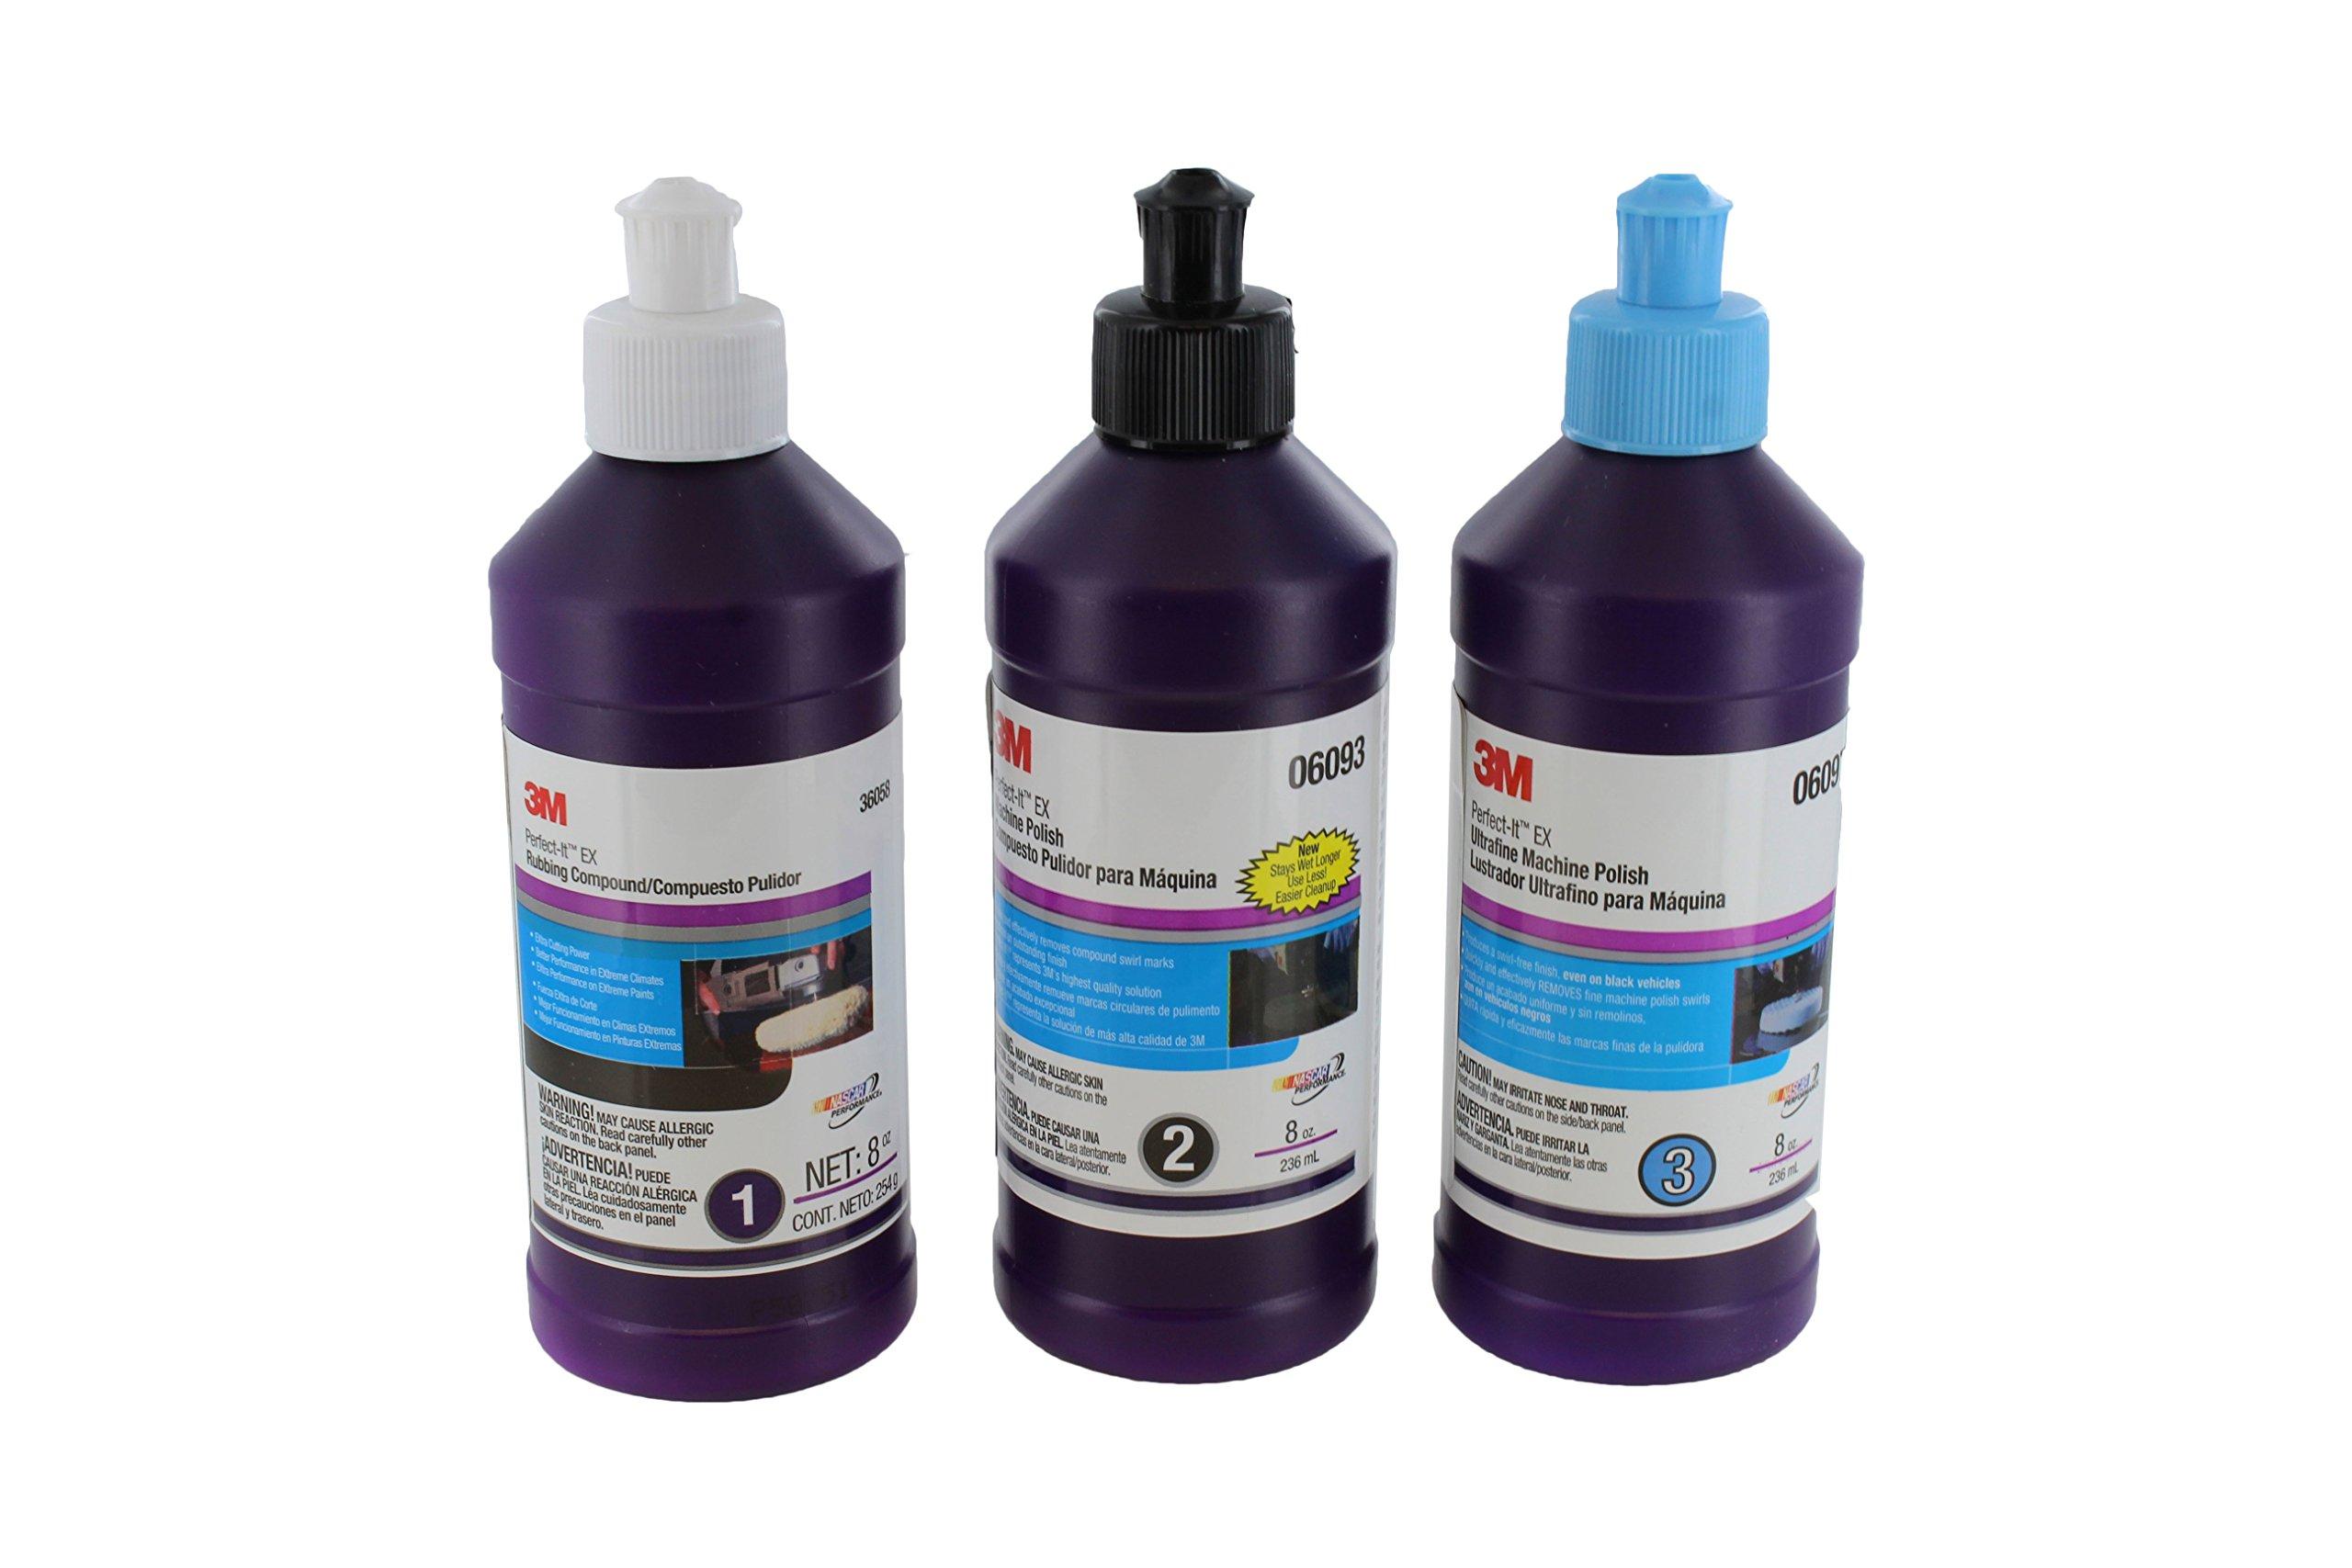 3M Perfect-It 8oz Buffing & Polishing Compound 36058, 06093, 06097 by 3M